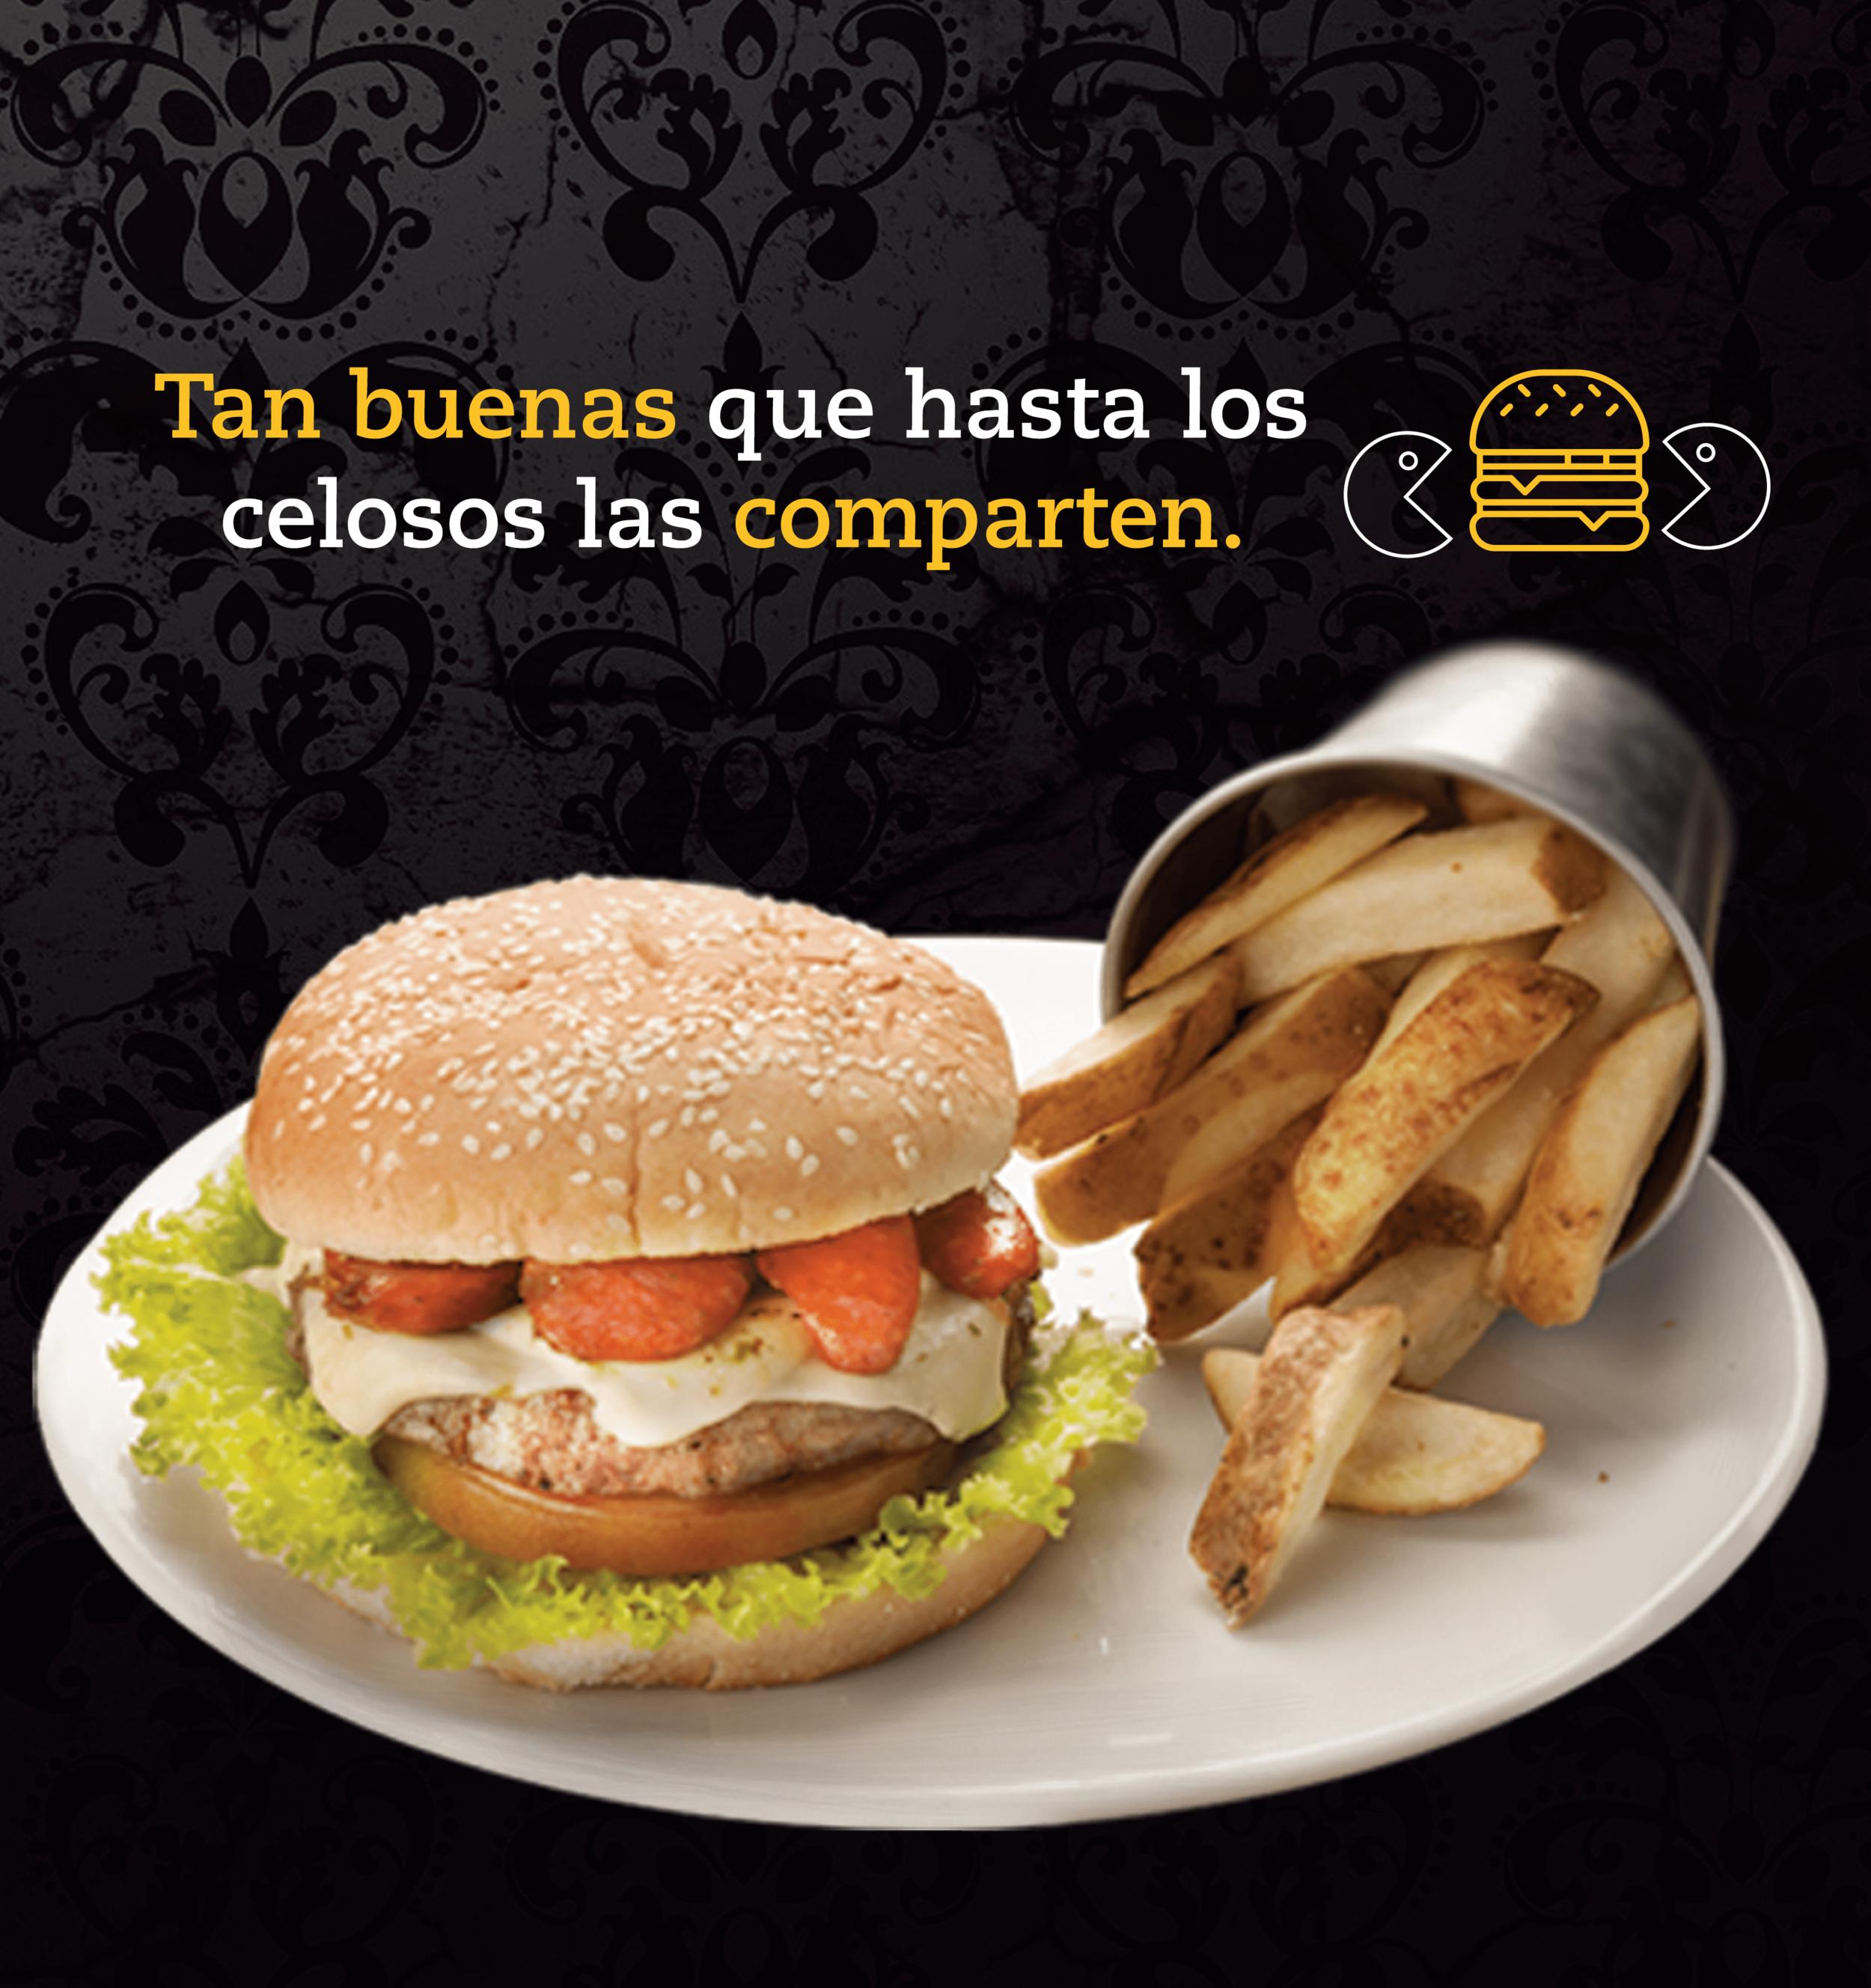 hamburguesas_3-min.png